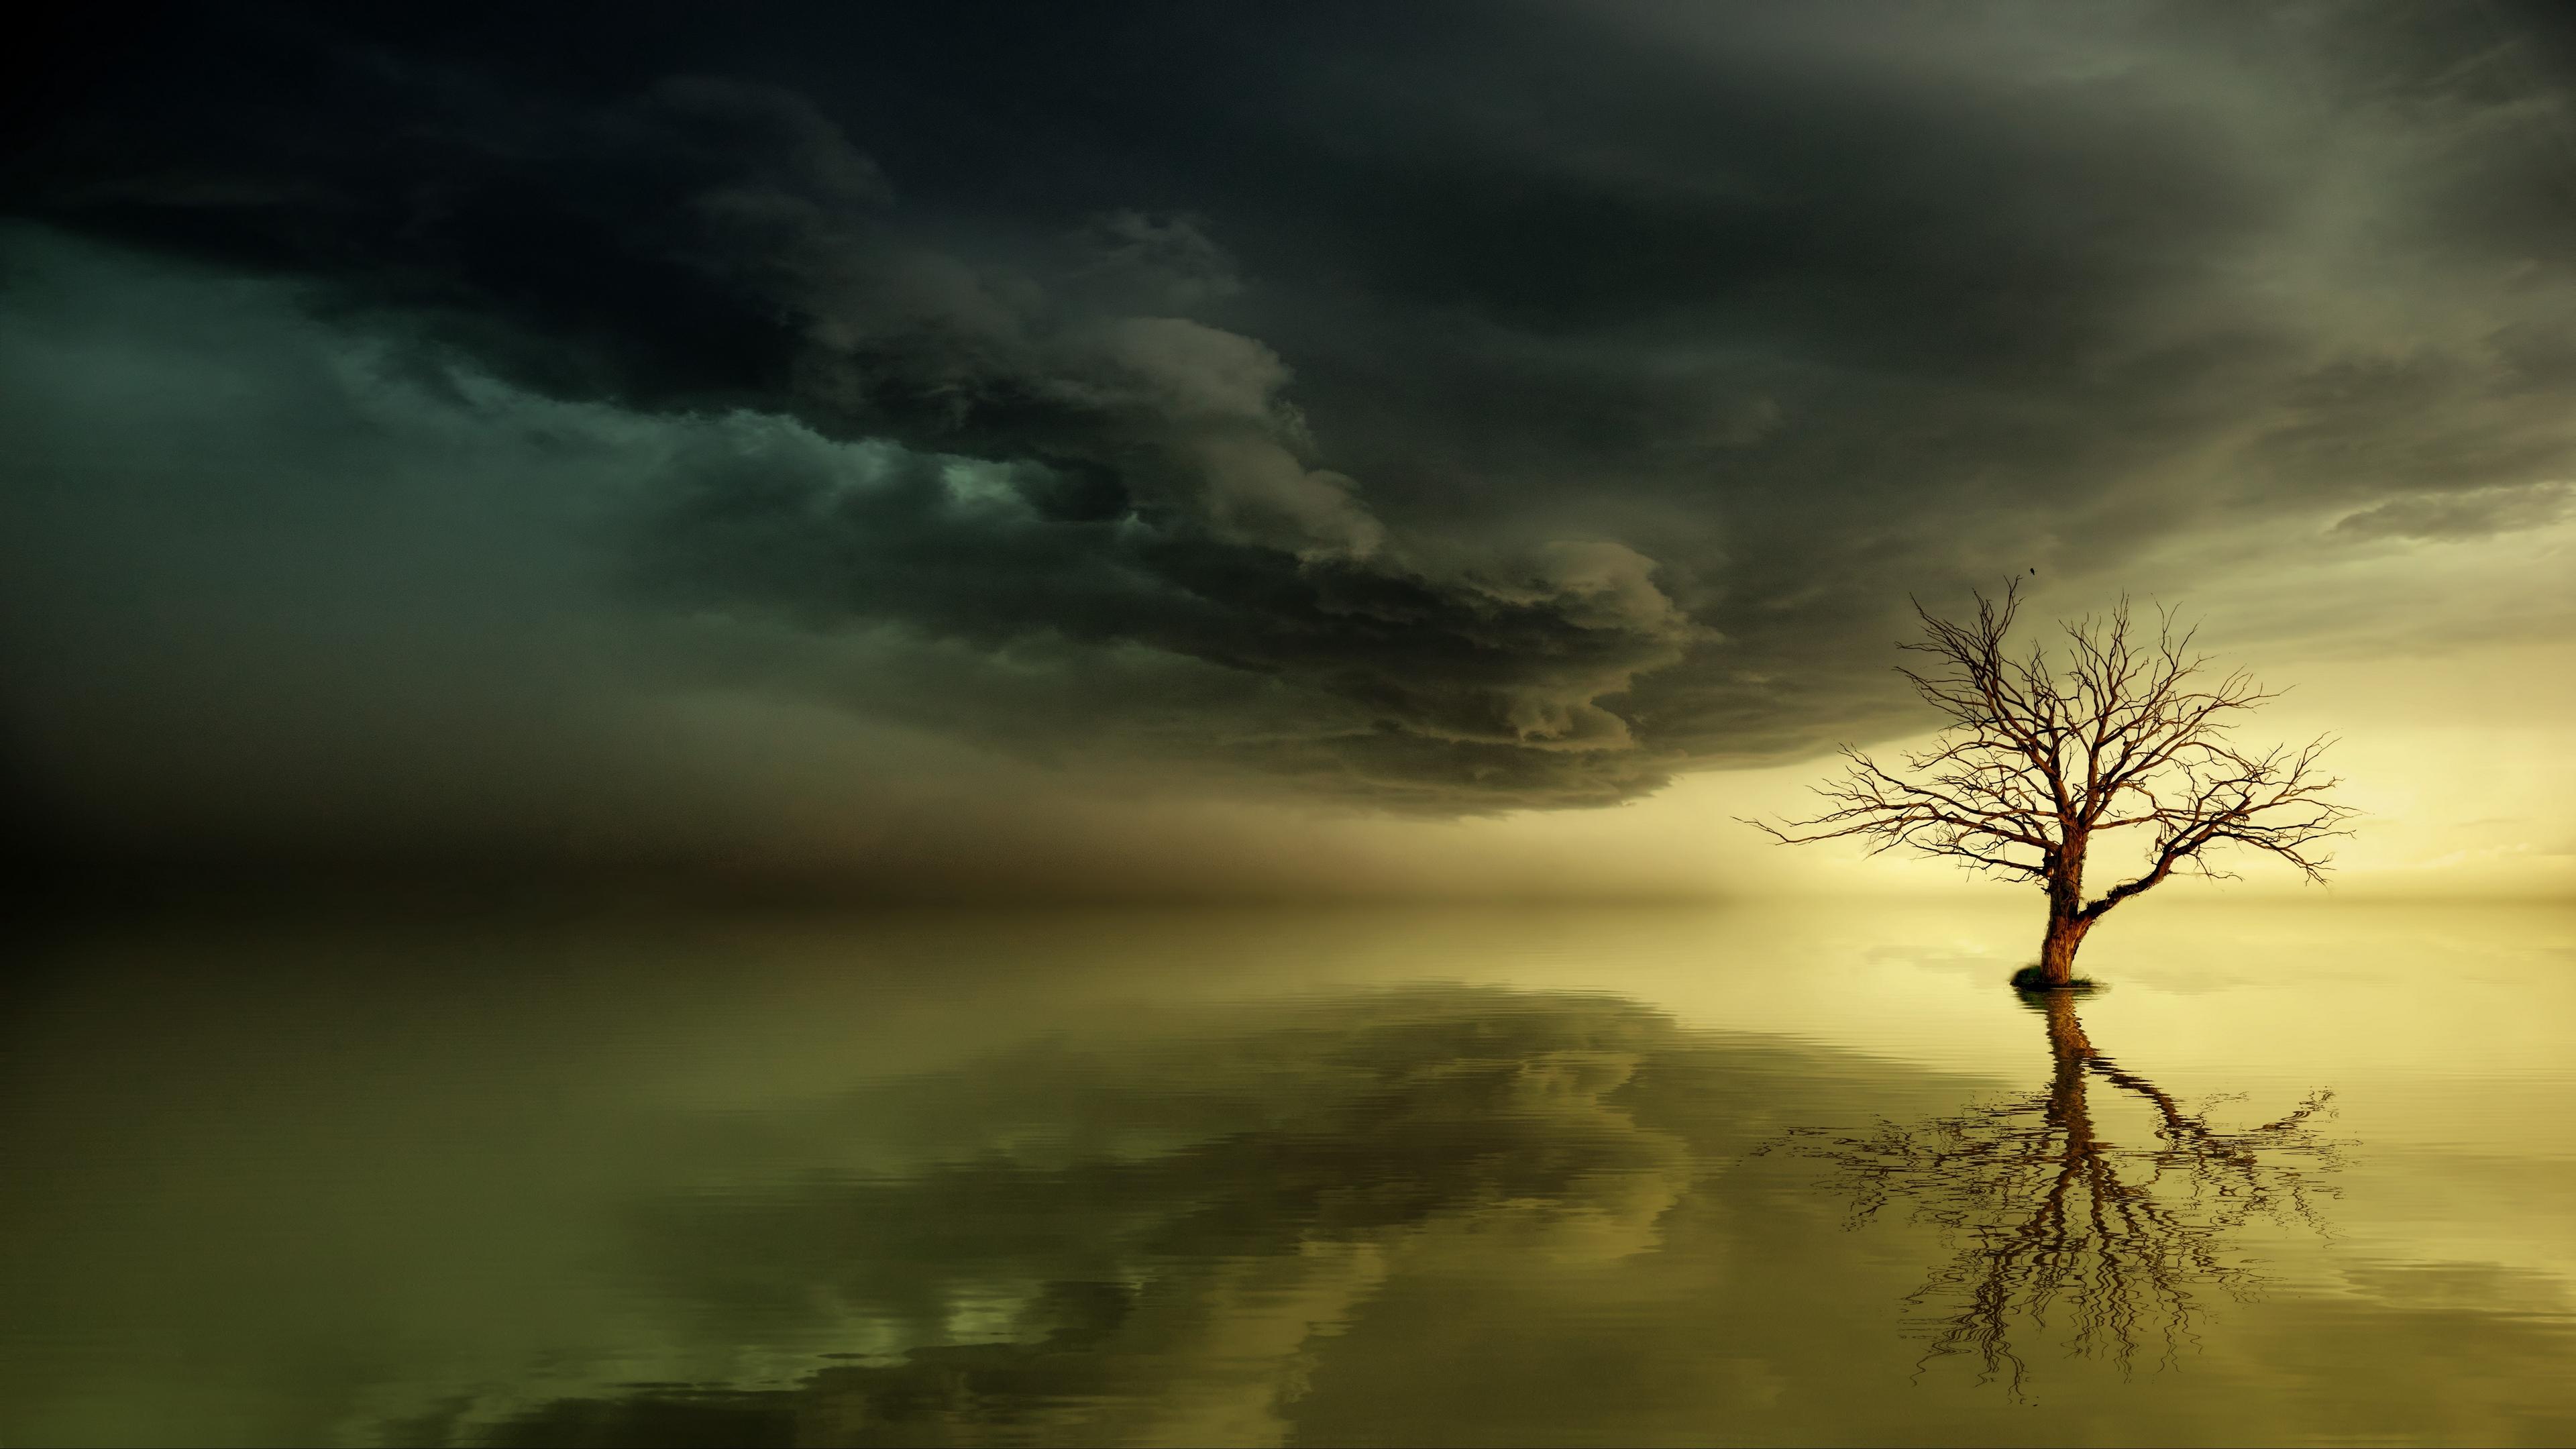 tree lonely reflection horizon 4k 1541117446 - tree, lonely, reflection, horizon 4k - tree, reflection, Lonely